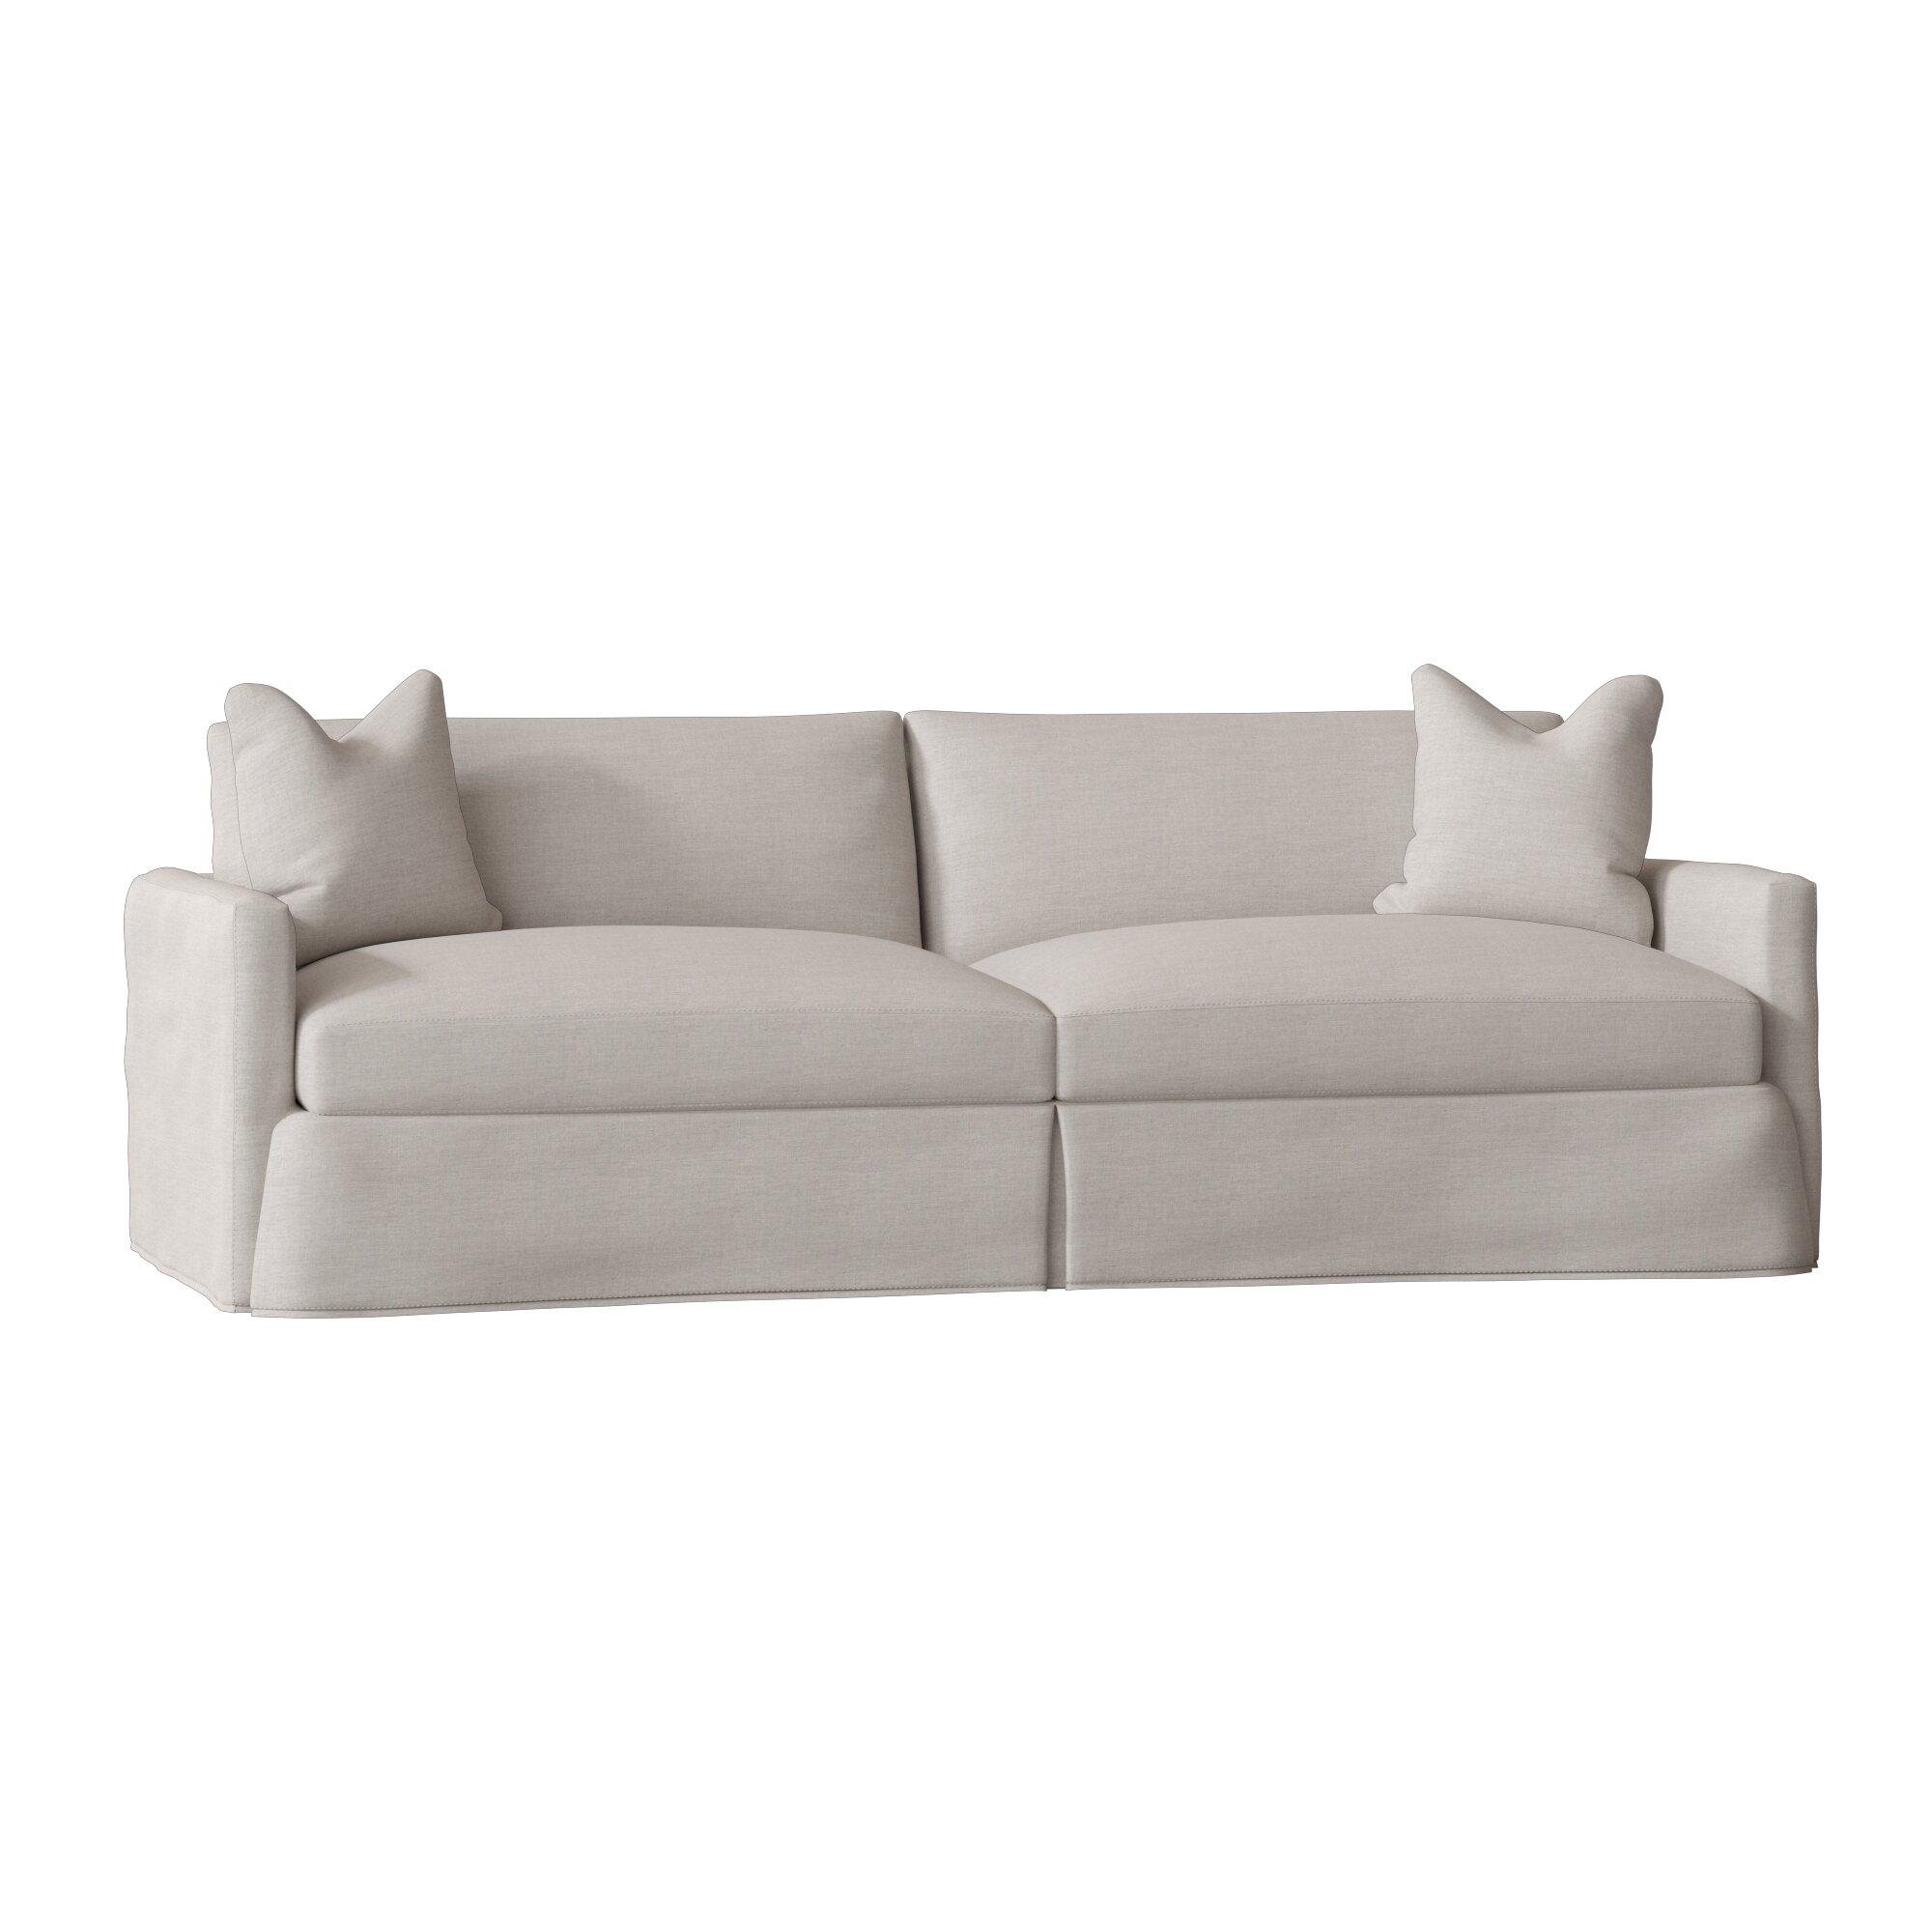 Wayfair Custom Upholstery Madison Xl Slipcovered Sofa Reviews